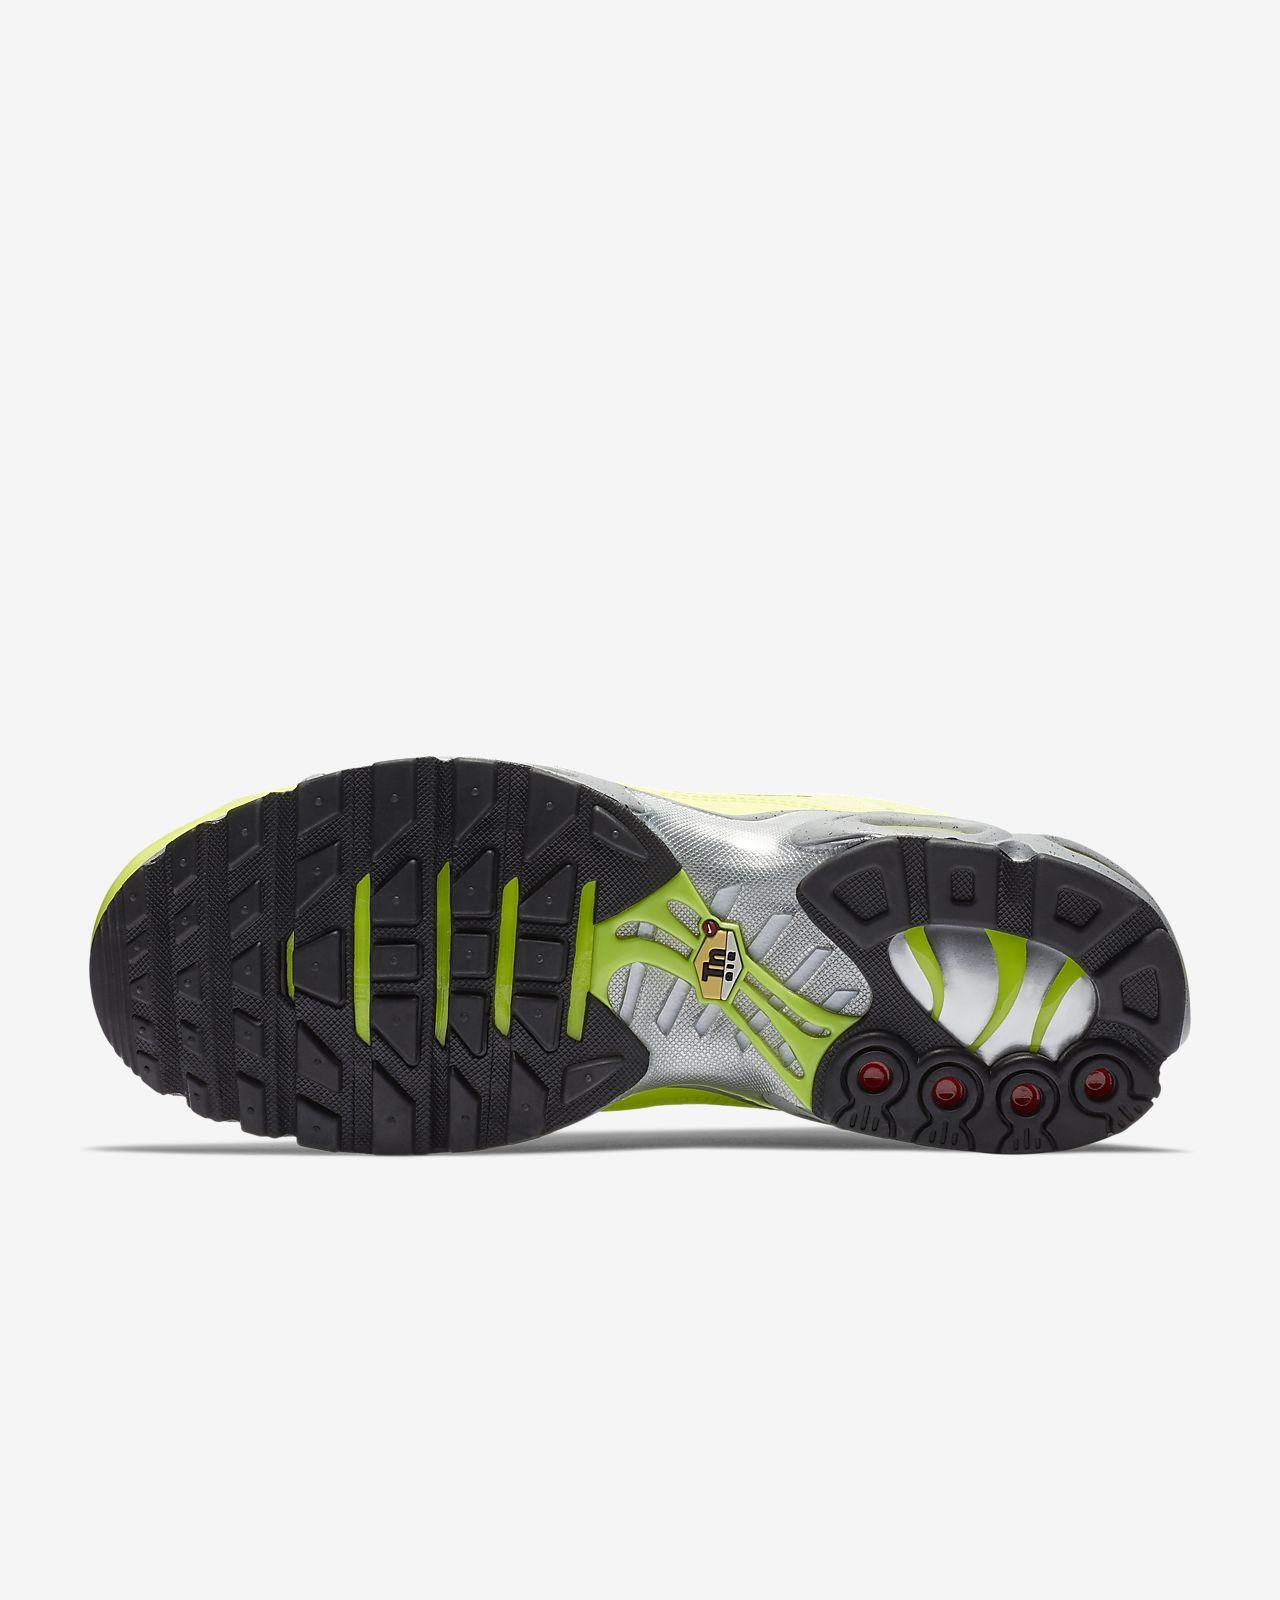 finest selection 124fa ad6bc ... Nike Air Max Plus Premium Men s Shoe